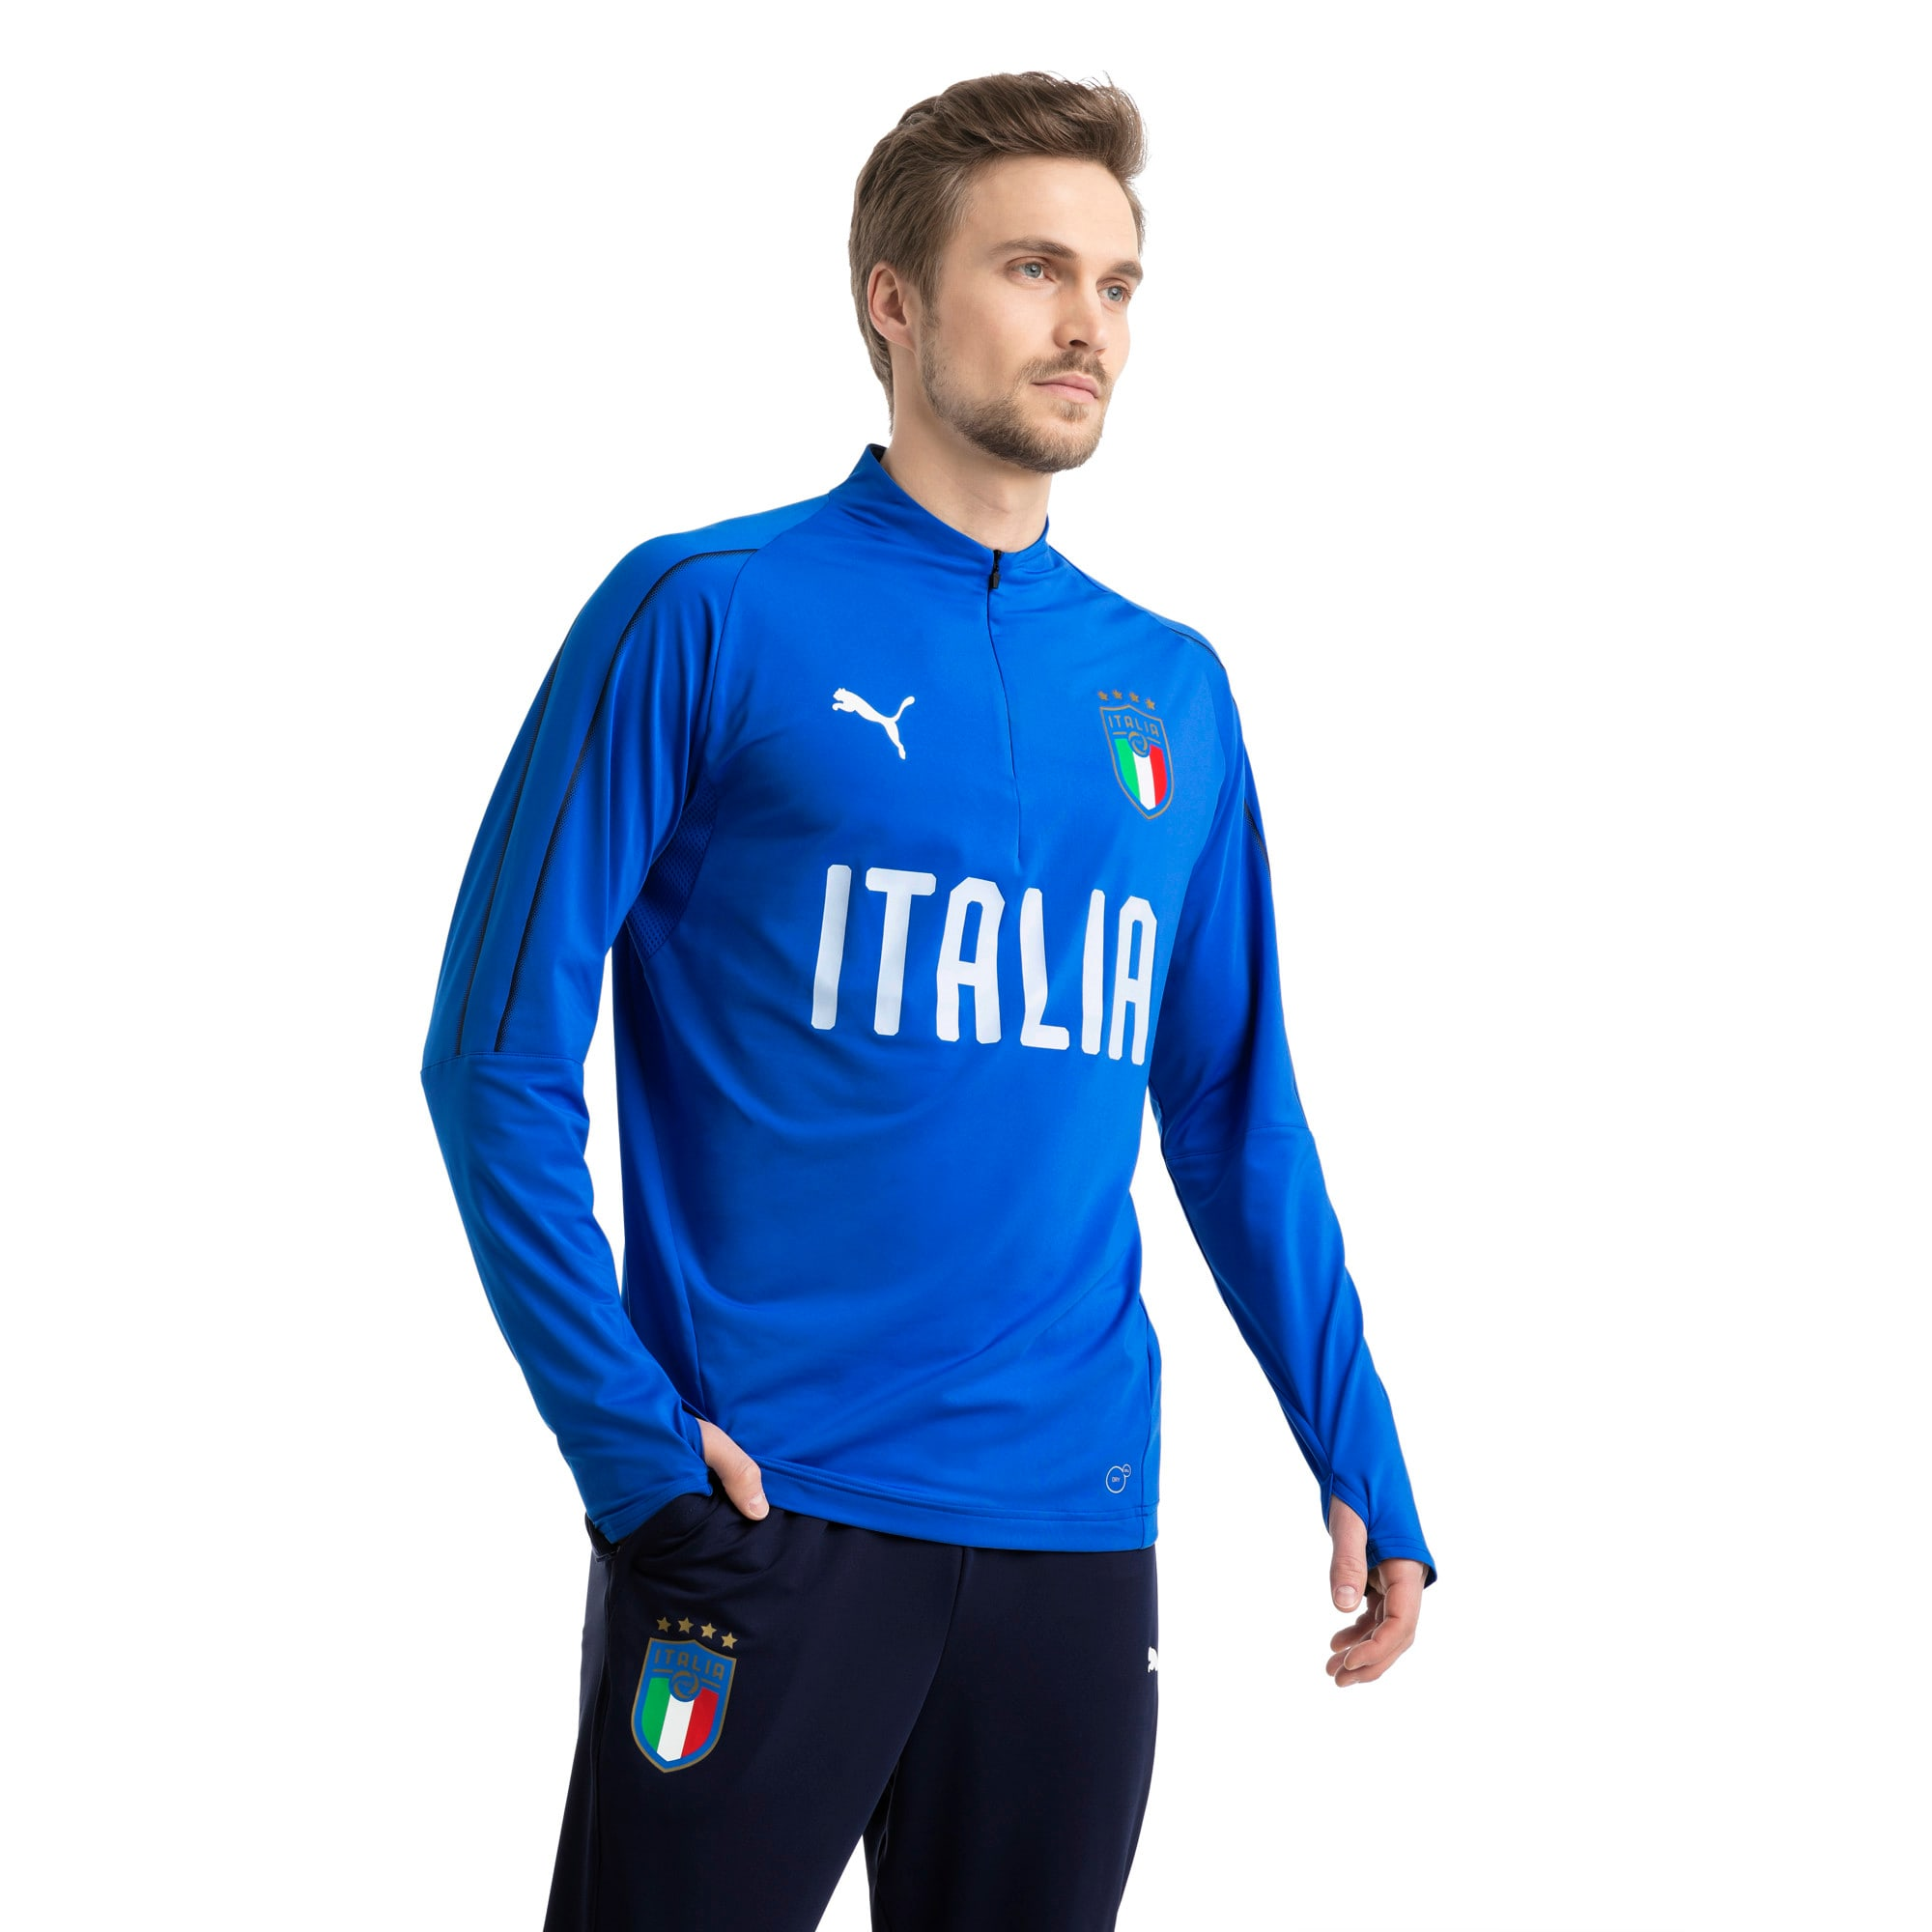 Thumbnail 2 of Italia 1/4 Zip Training Top, Team Power Blue-White, medium